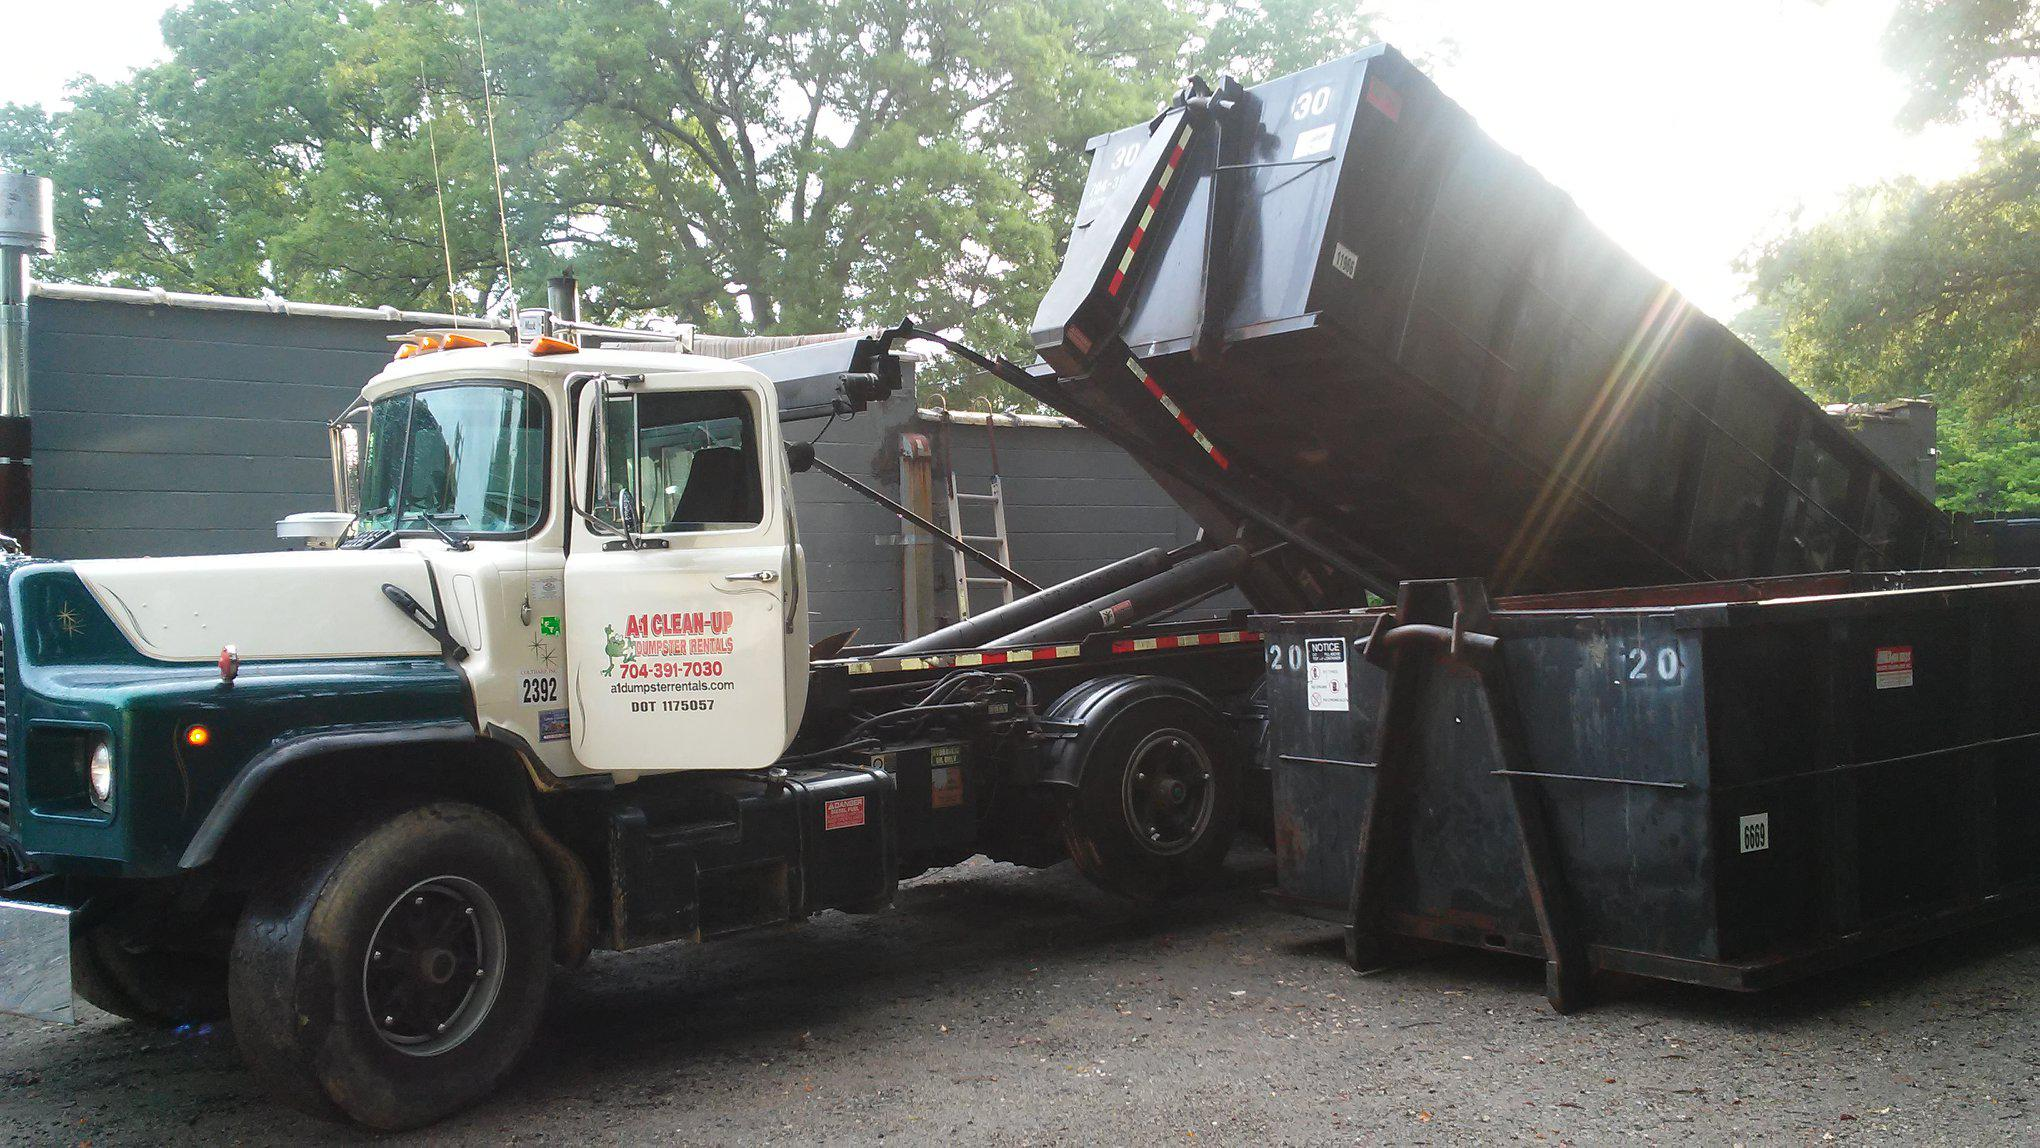 A1 Dumpster Rentals